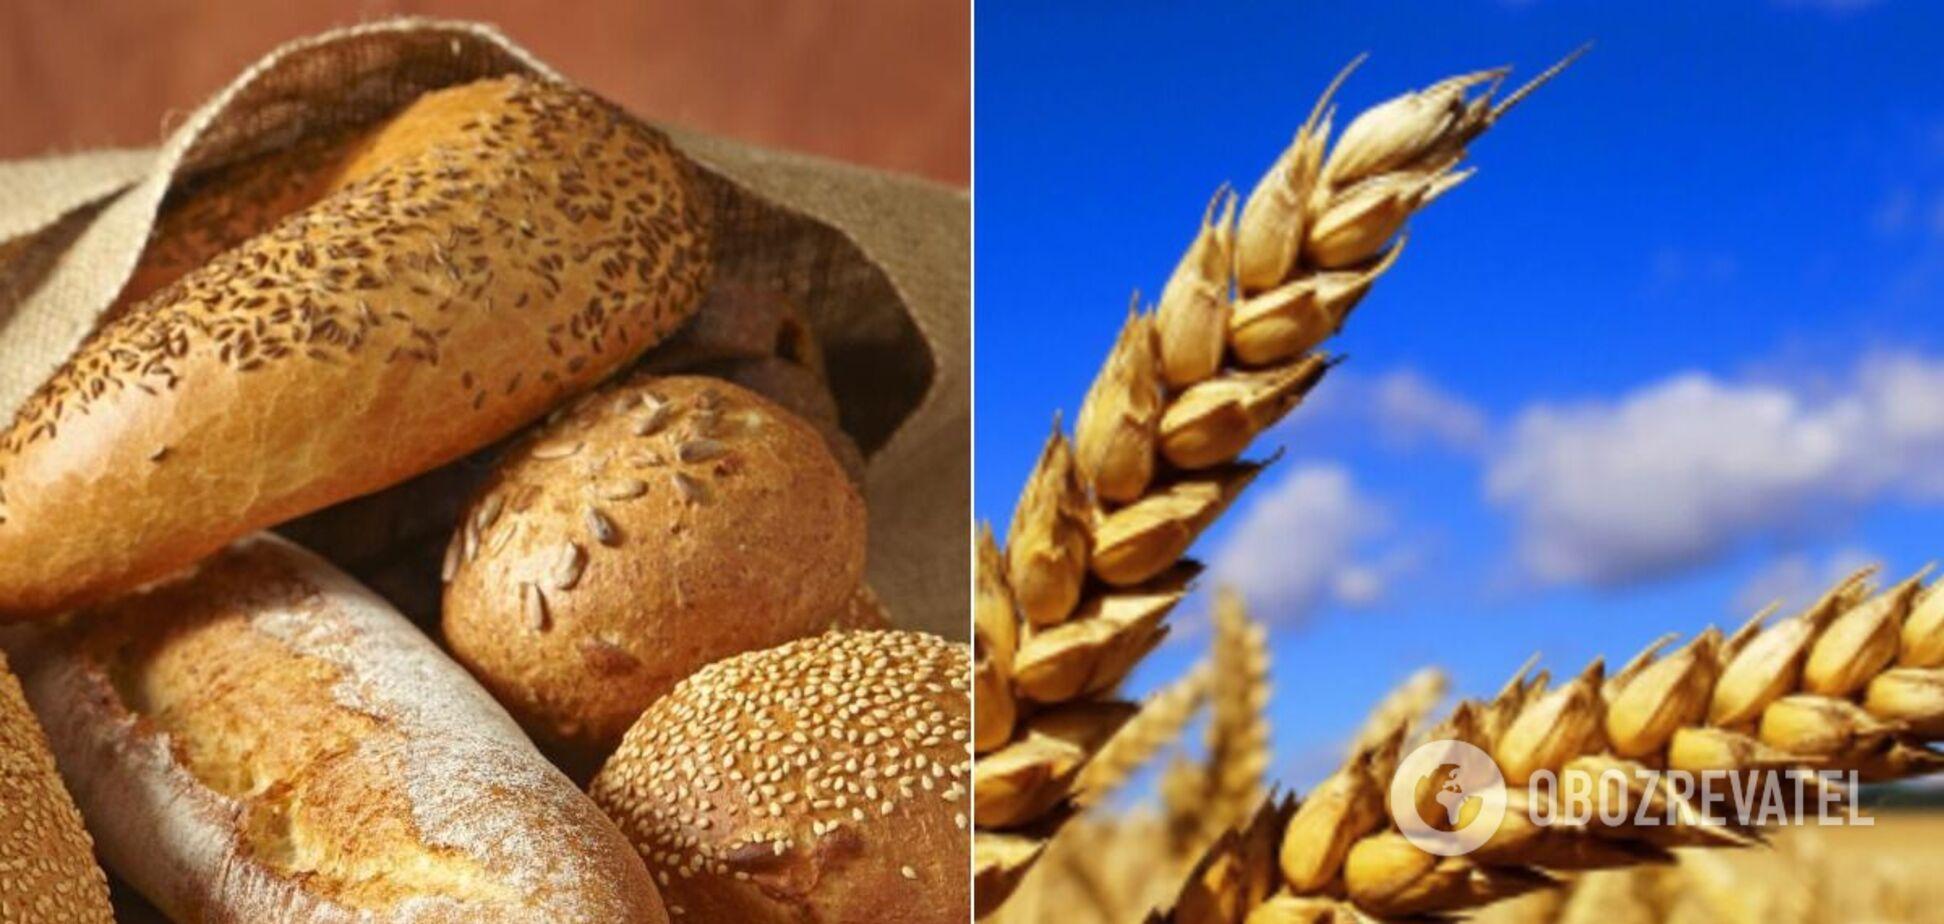 Почему в Украине растет цена на сахар и хлеб